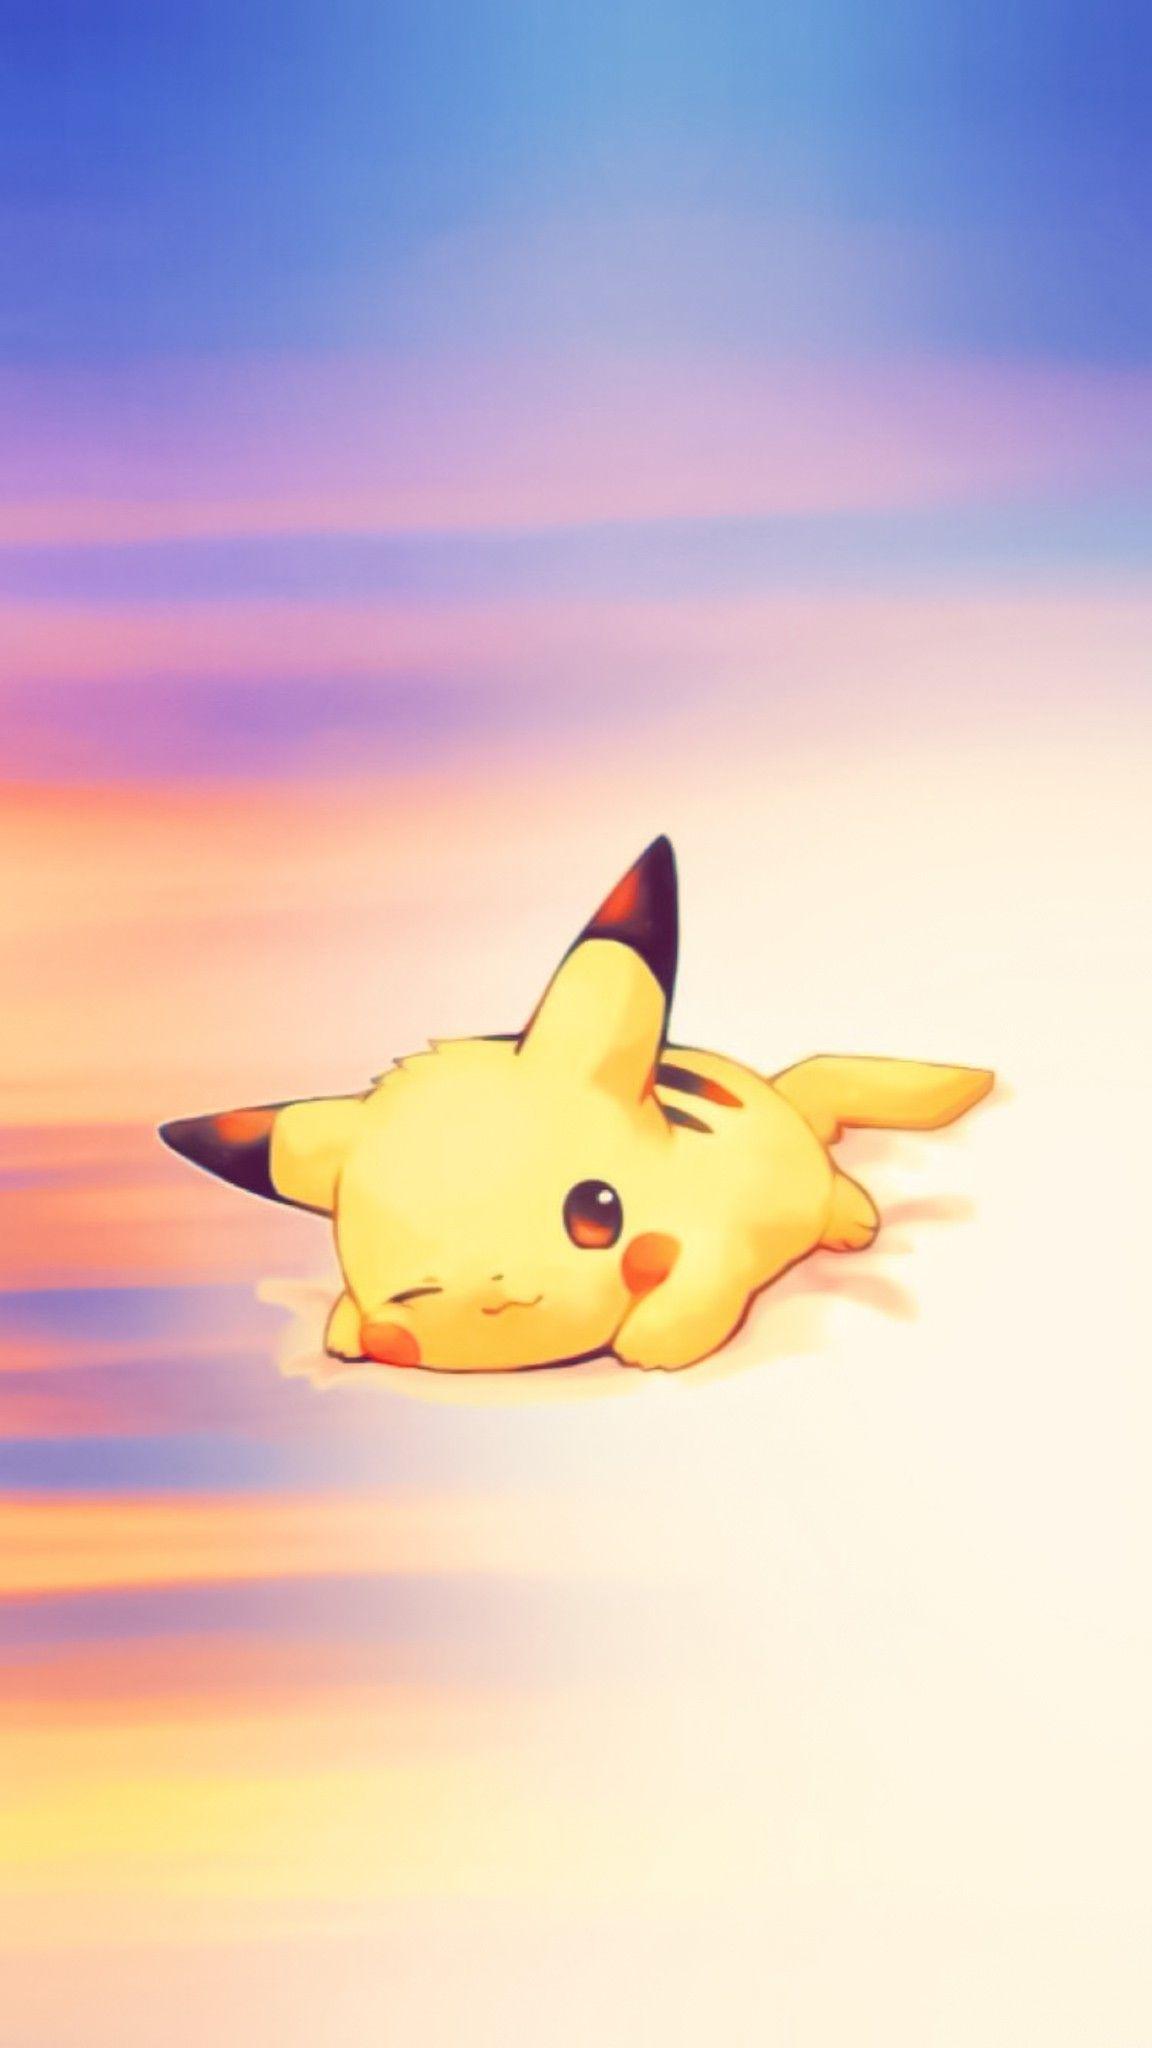 Pin By Aekkalisa On Pokemon Bg Pikachu Drawing Cute Pikachu Pikachu Art Cute anime pokemon wallpaper